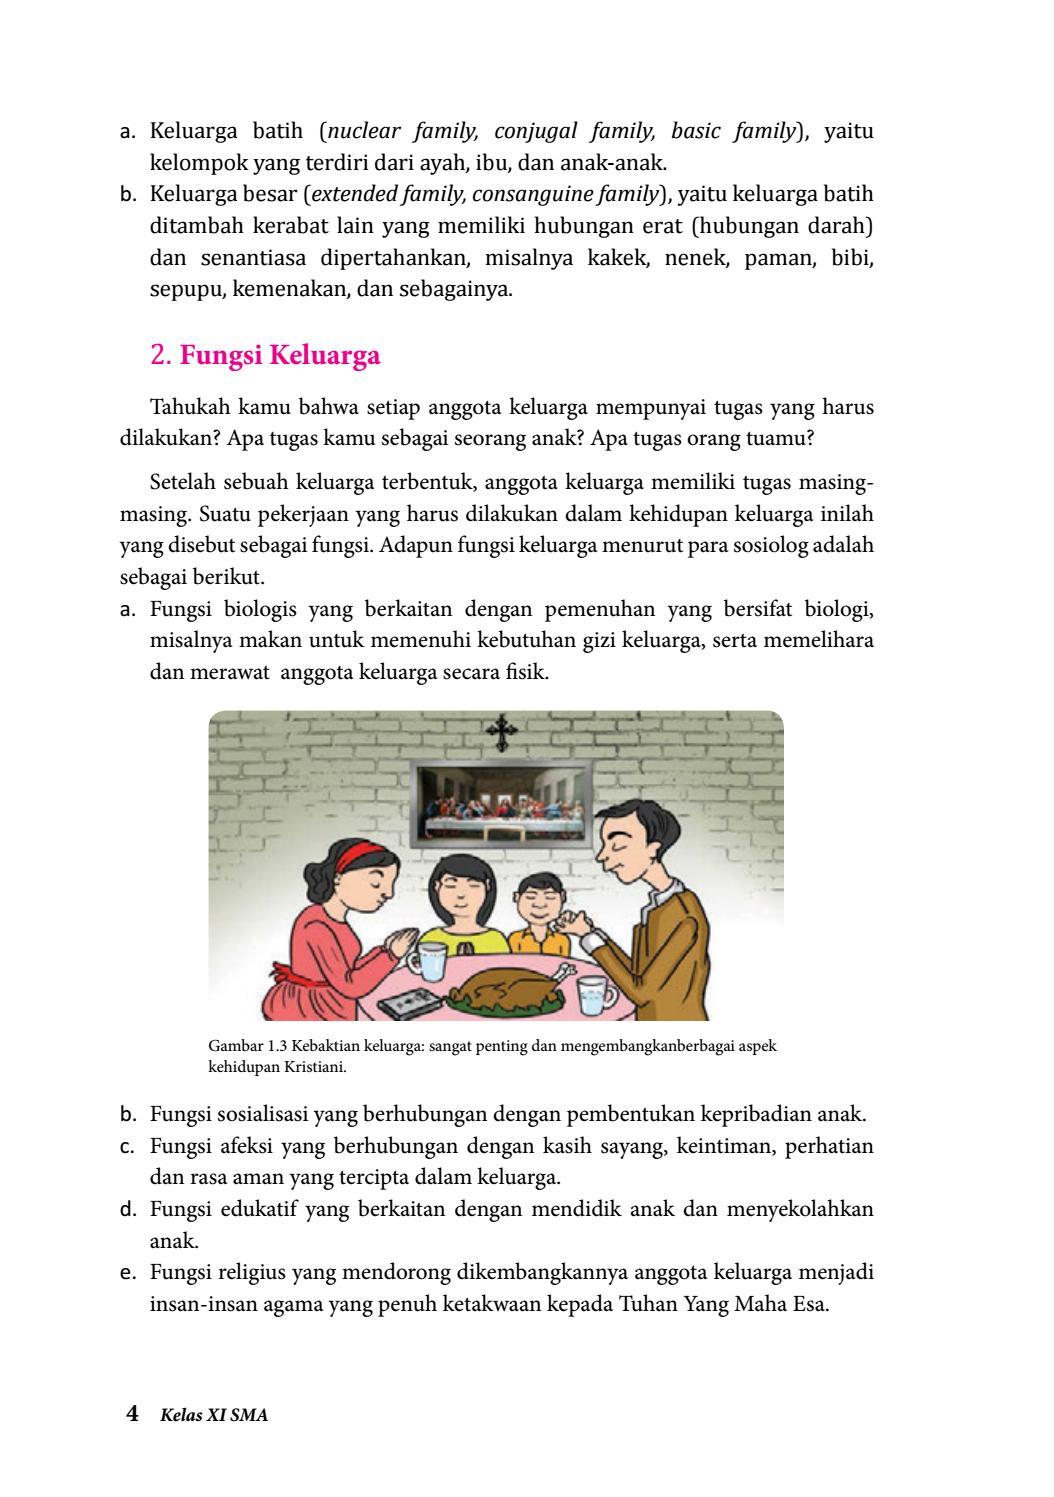 Keluarga Yang Terdiri Dari Ayah Ibu Dan Anak Disebut : keluarga, terdiri, disebut, Pendidikan, Agama, Kristen, Pekerti, Kelas, Oppah, Issuu